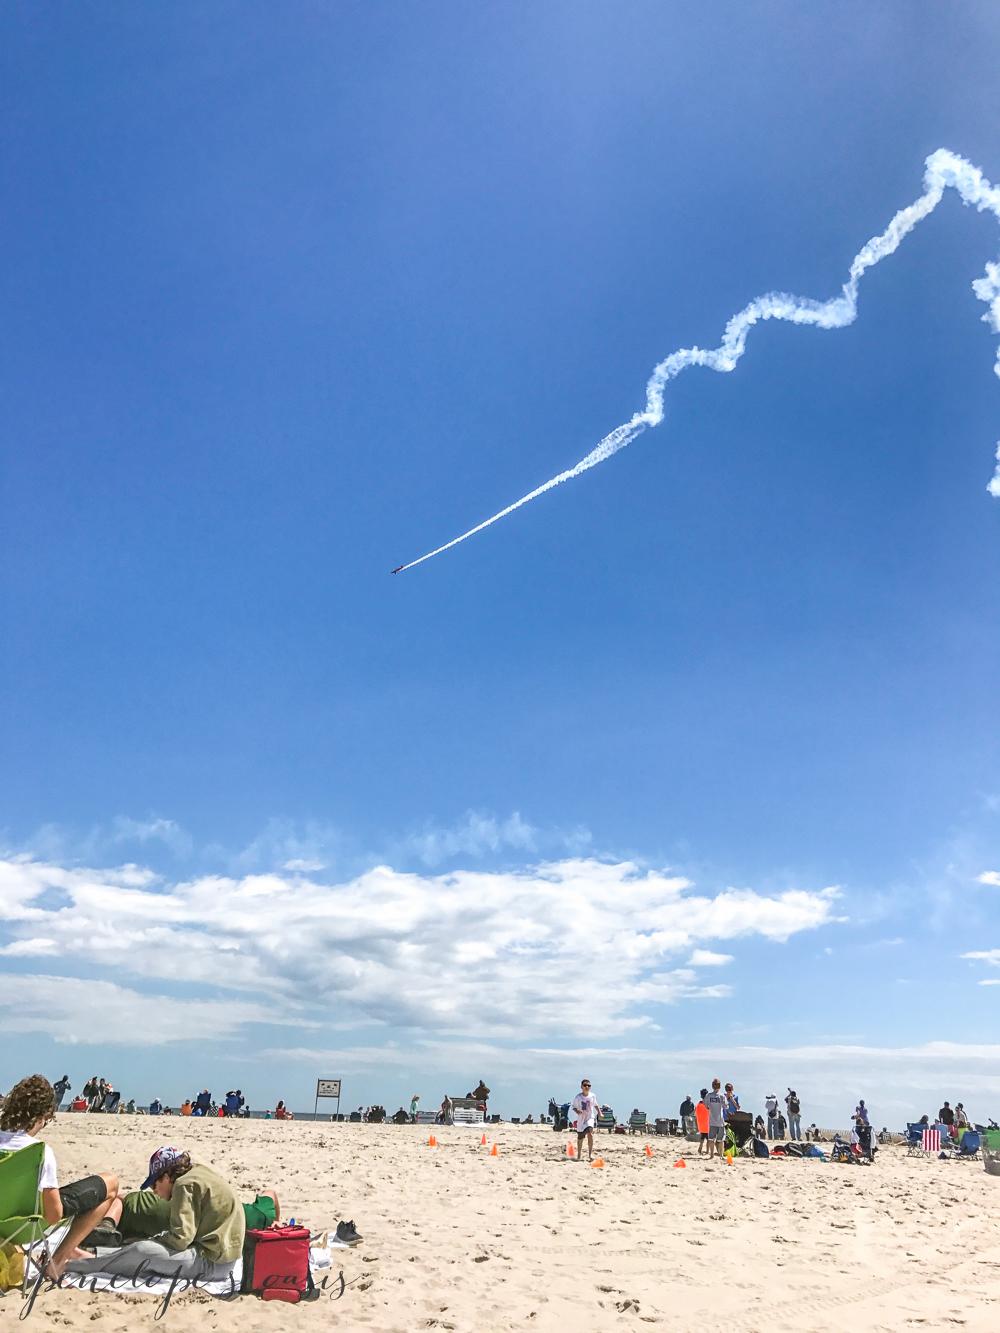 A Few Scenes From U.S. Air Force ThunderbirdsAir Show at ...